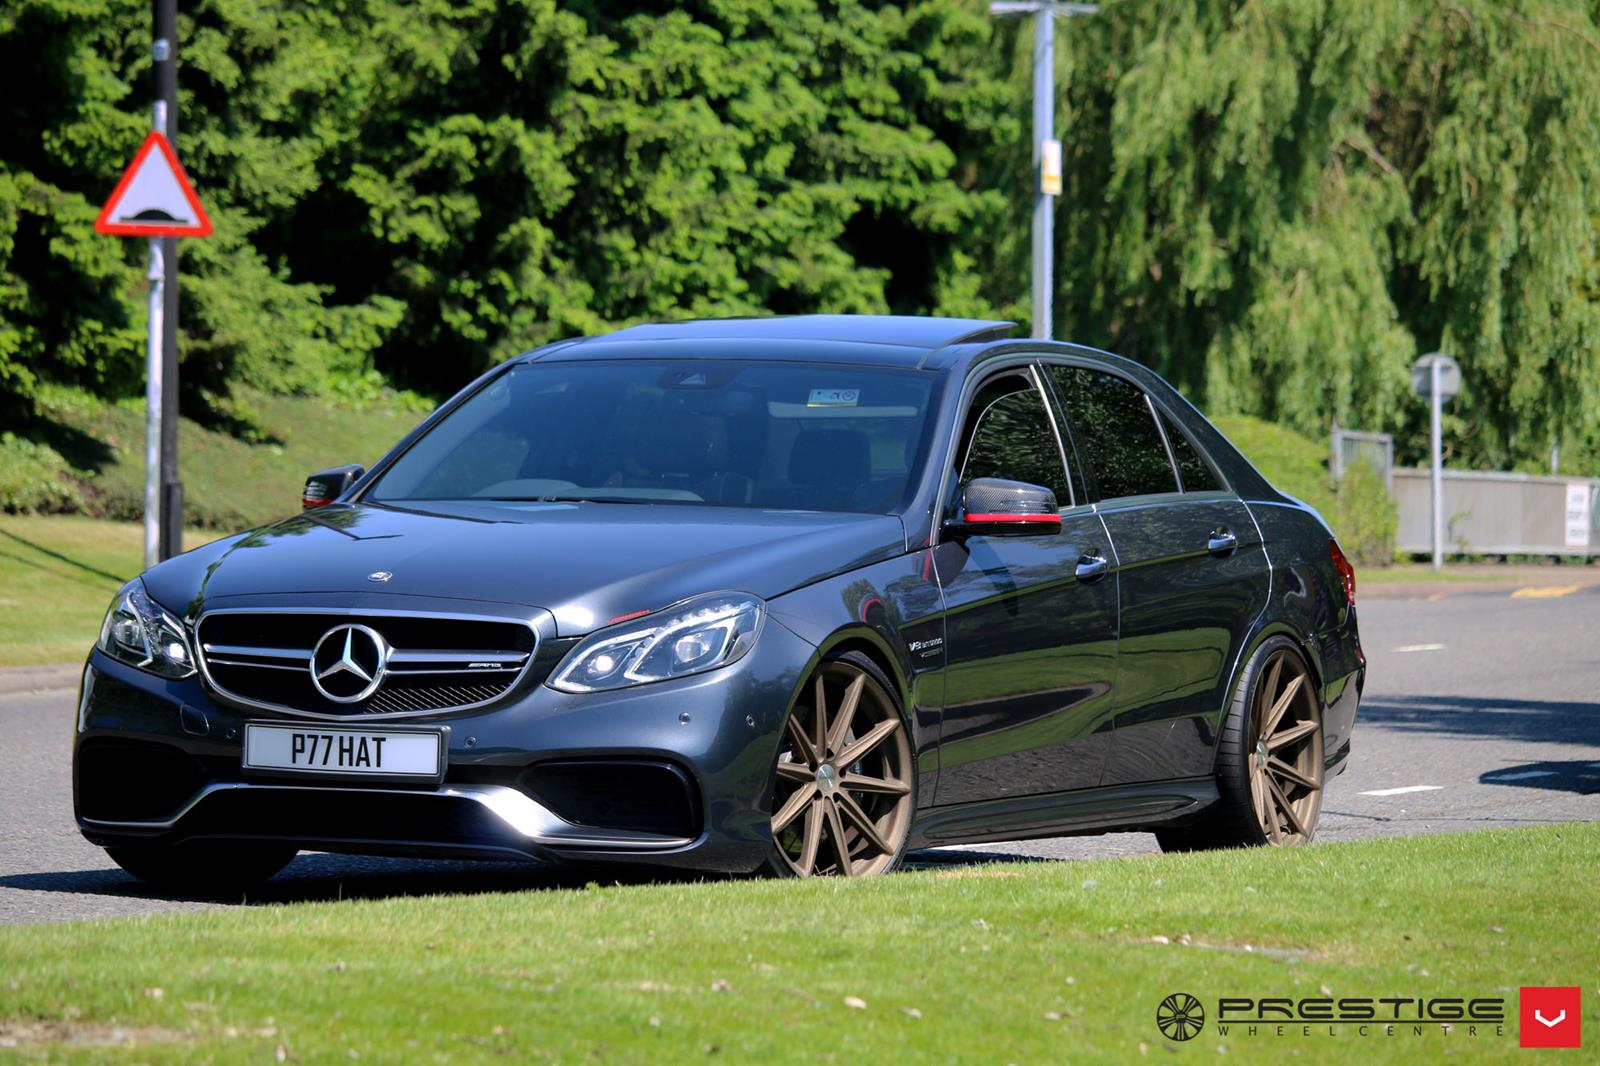 Mercedes benz w212 e63 amg on vossen vfs10 wheels benztuning for Mercedes benz 350 amg